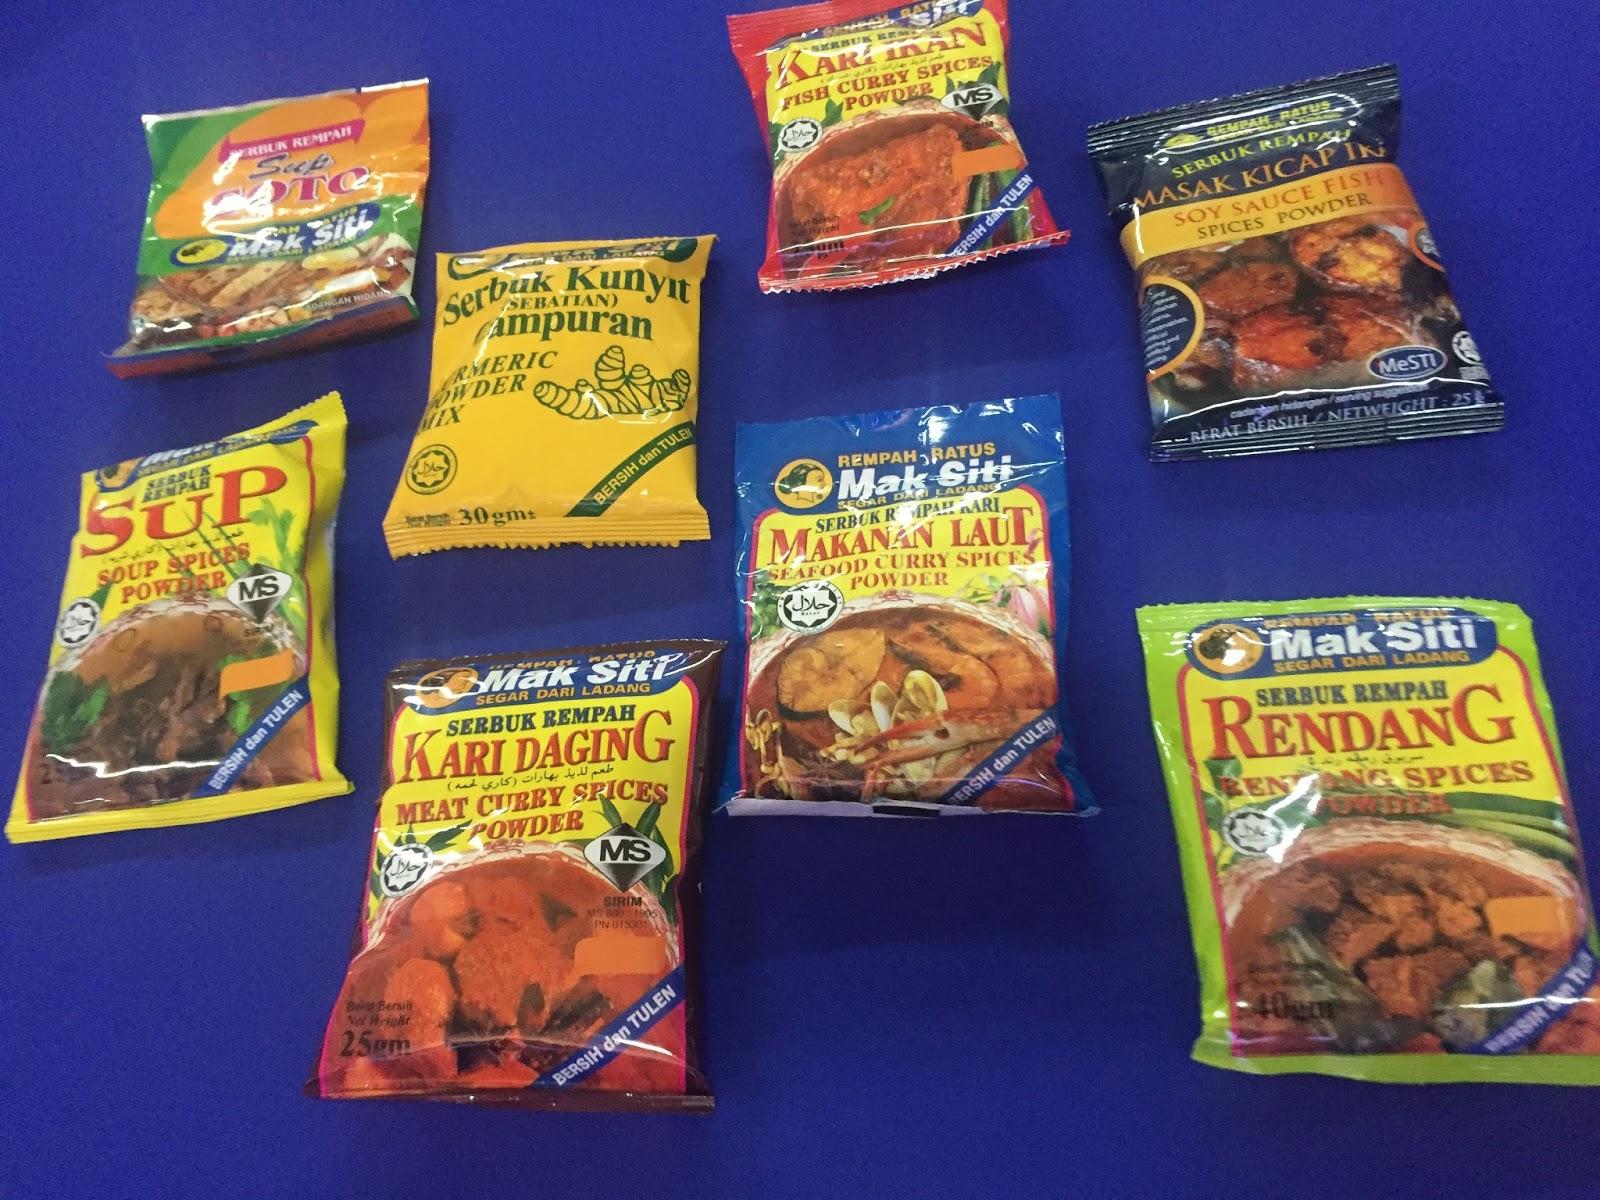 resepi ayam kurma club national chicken korma masala recipe homemade kepala bergetar Resepi Kentang Masala Enak dan Mudah